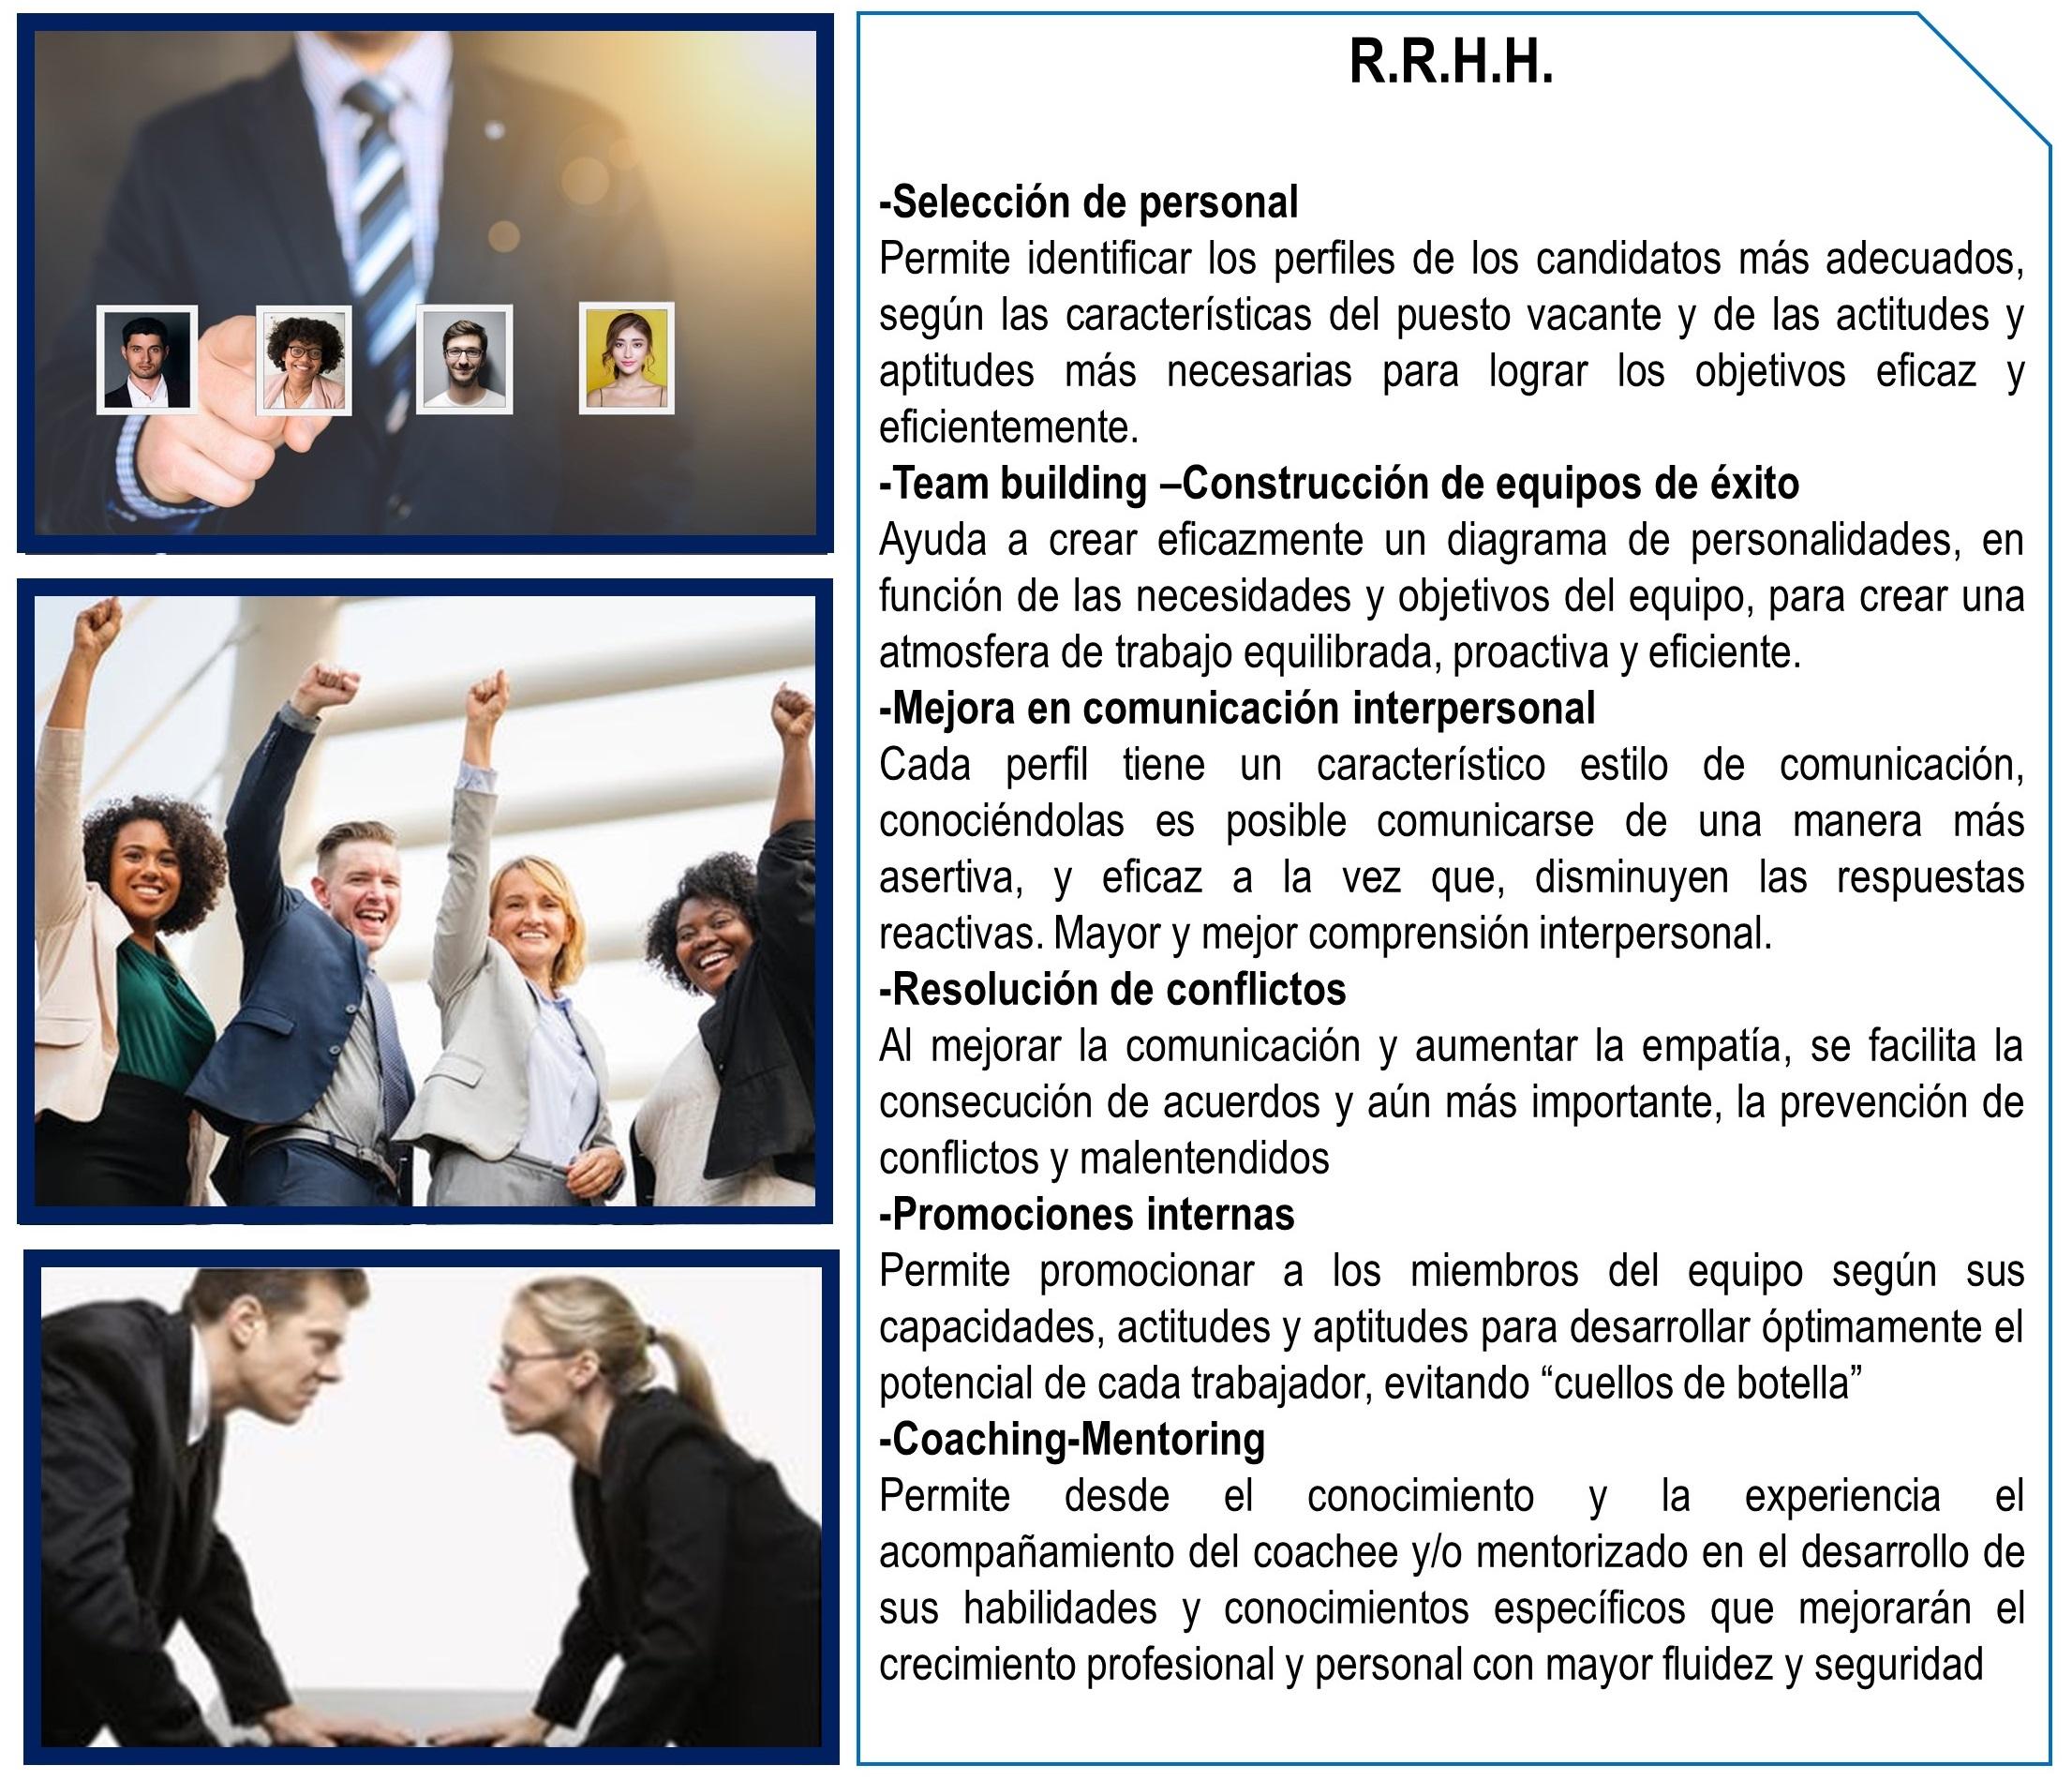 DISC para RRHH (Recursos Humanos